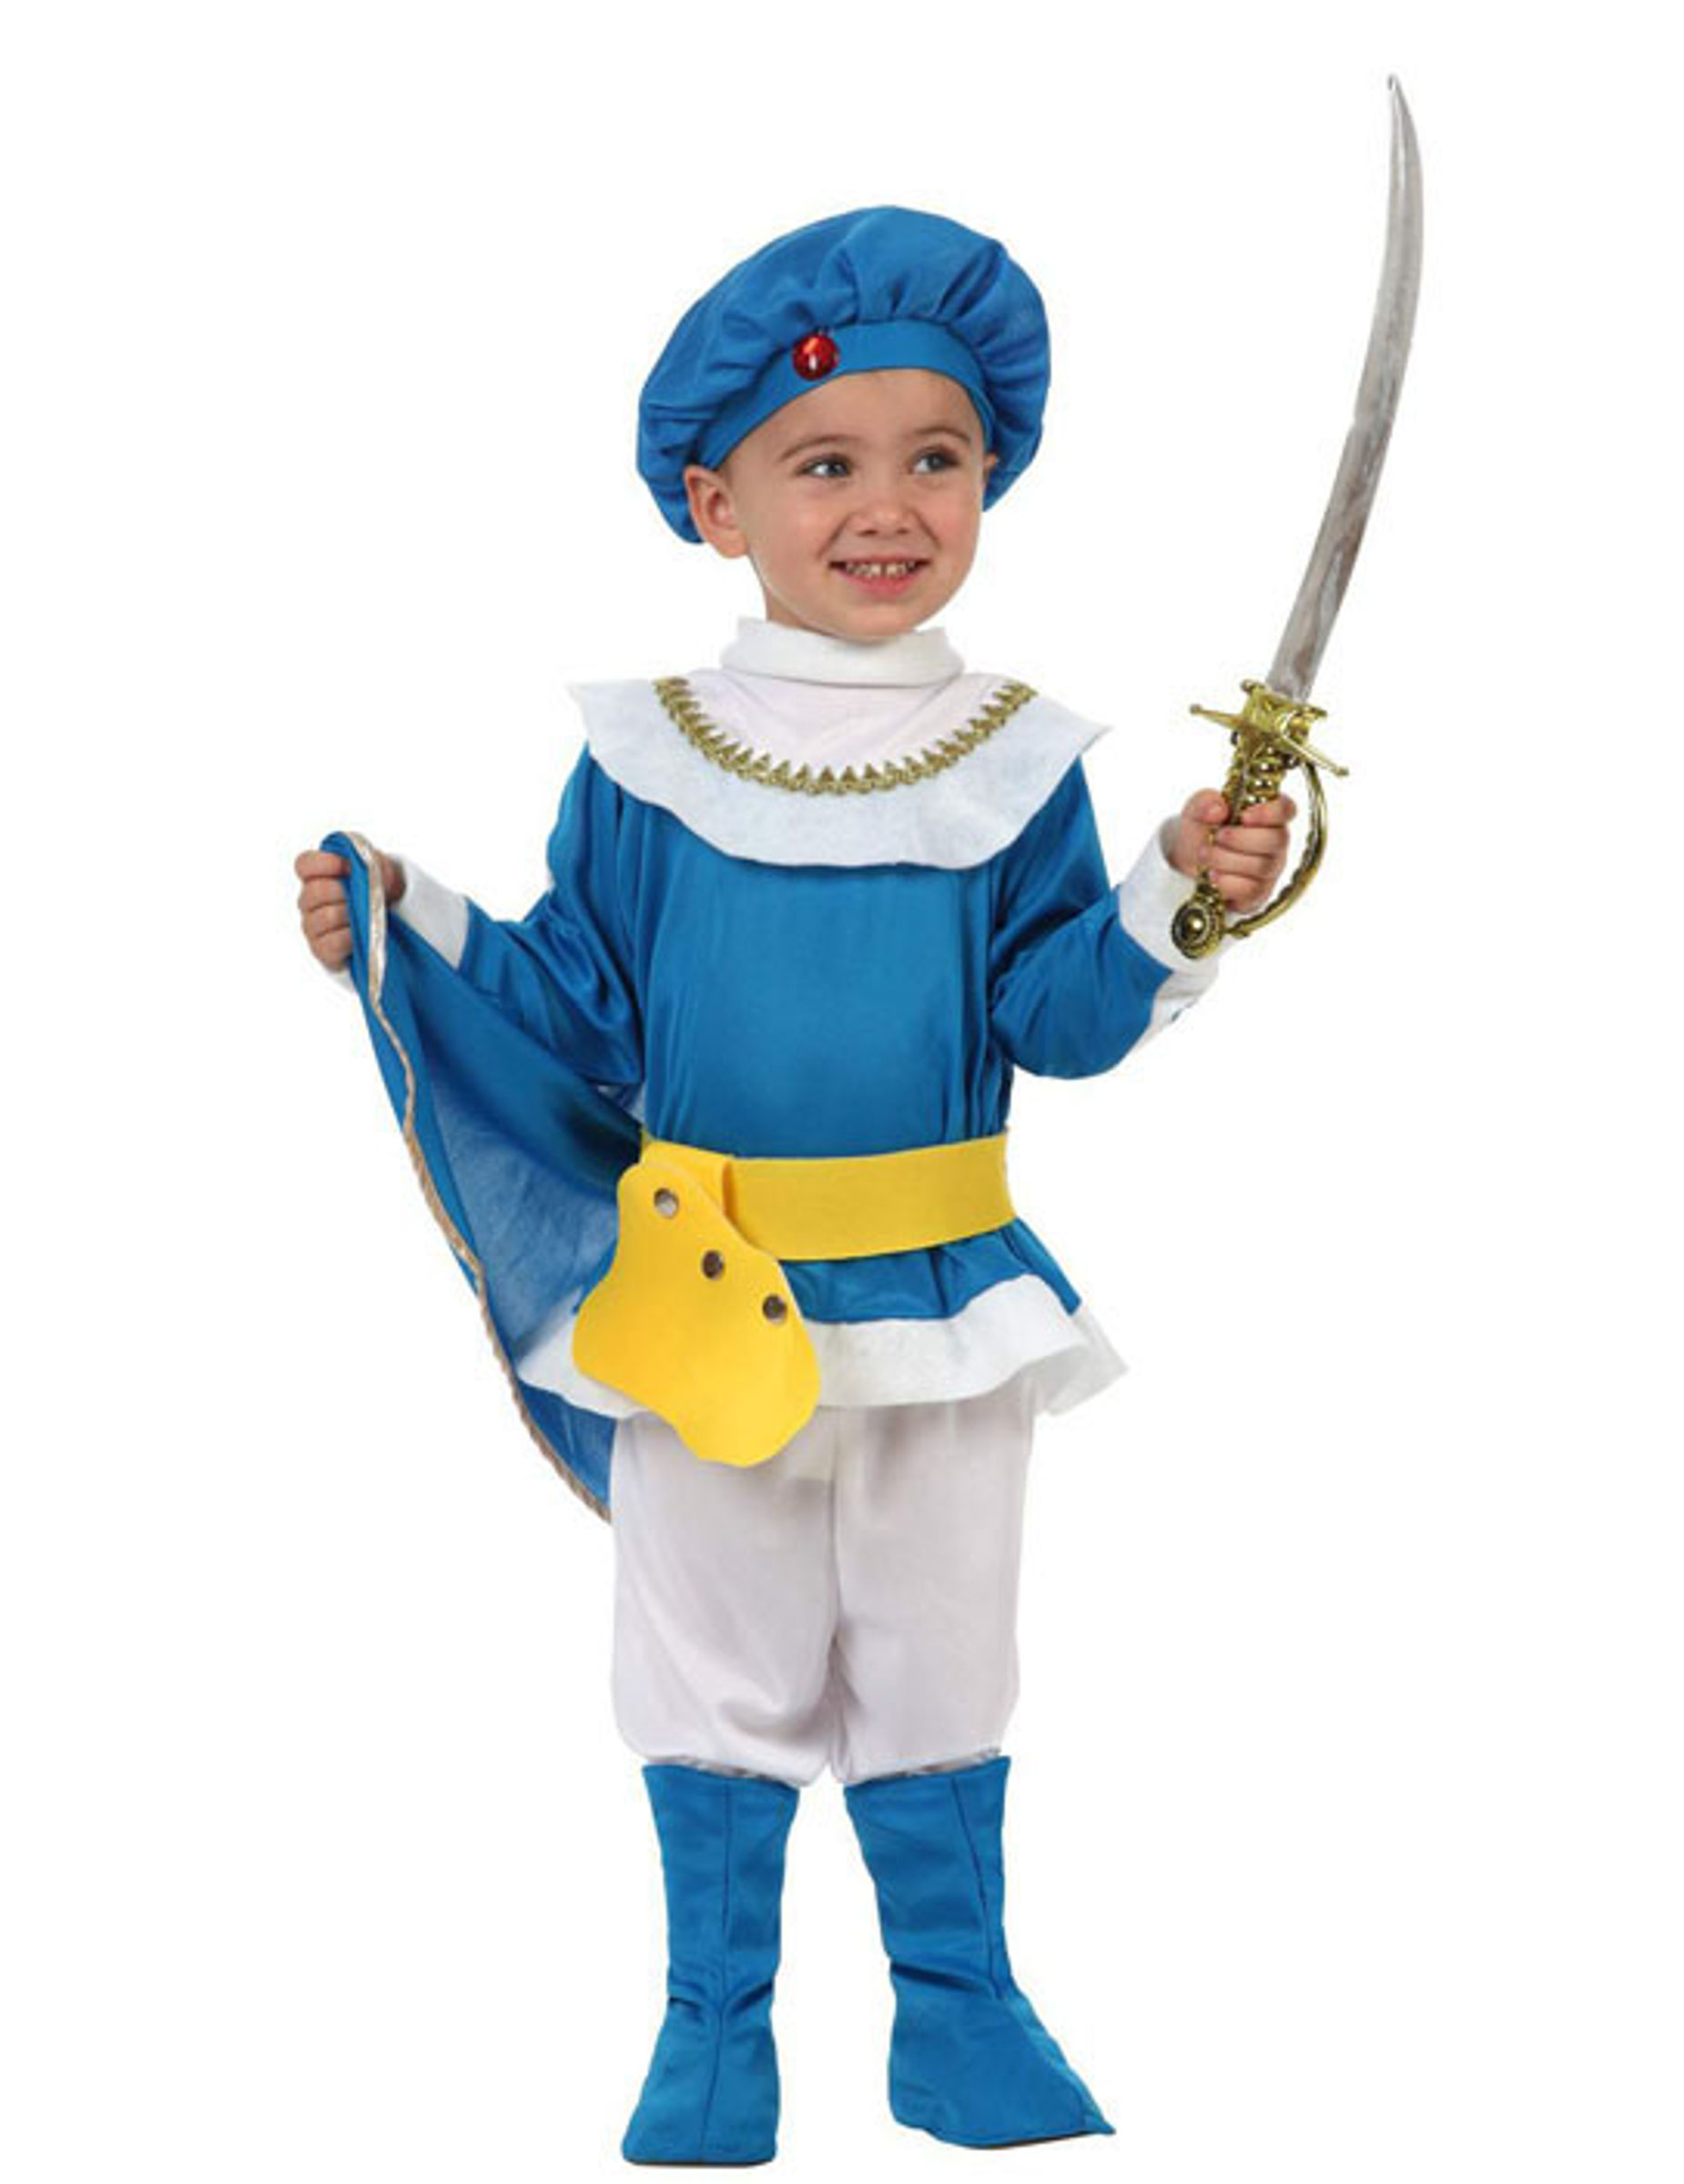 2ad2098977fb6 Déguisement petit prince bleu garçon   Deguise-toi